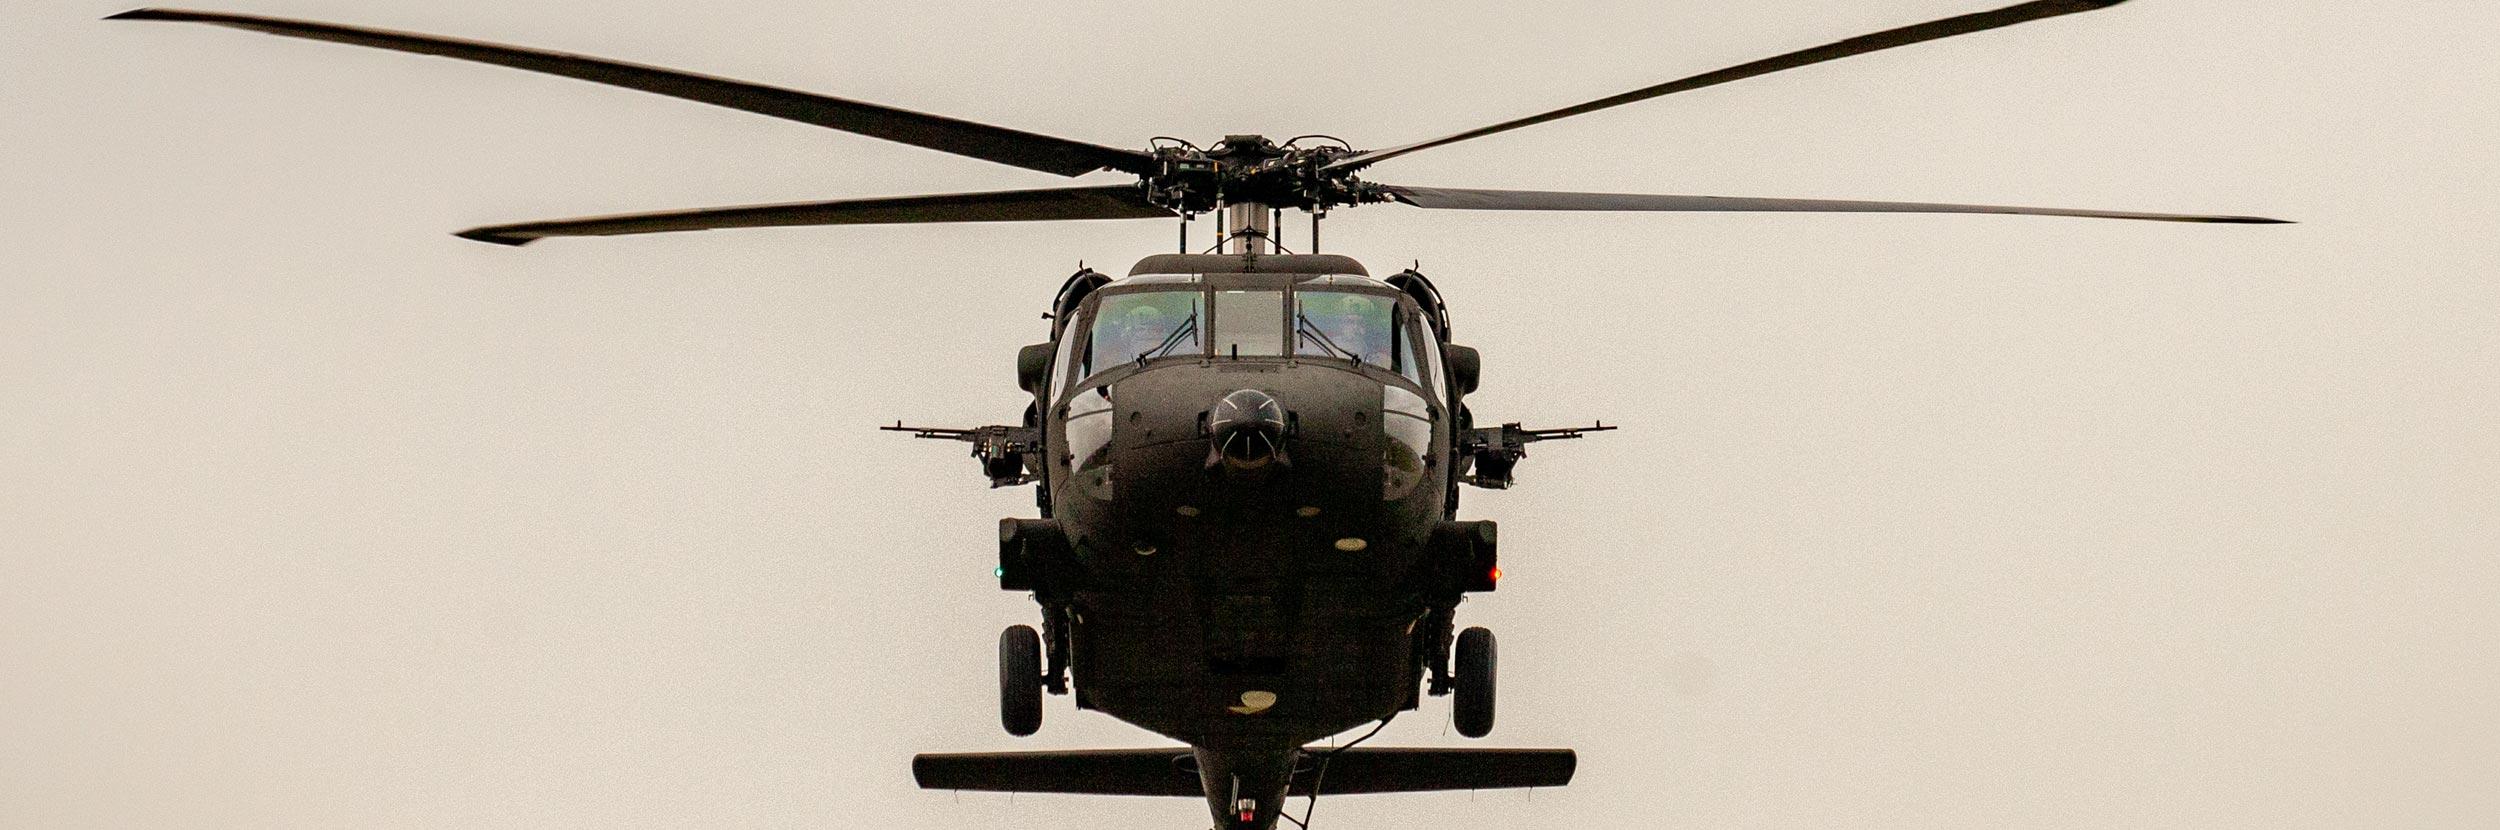 Bundesheer: Black 72